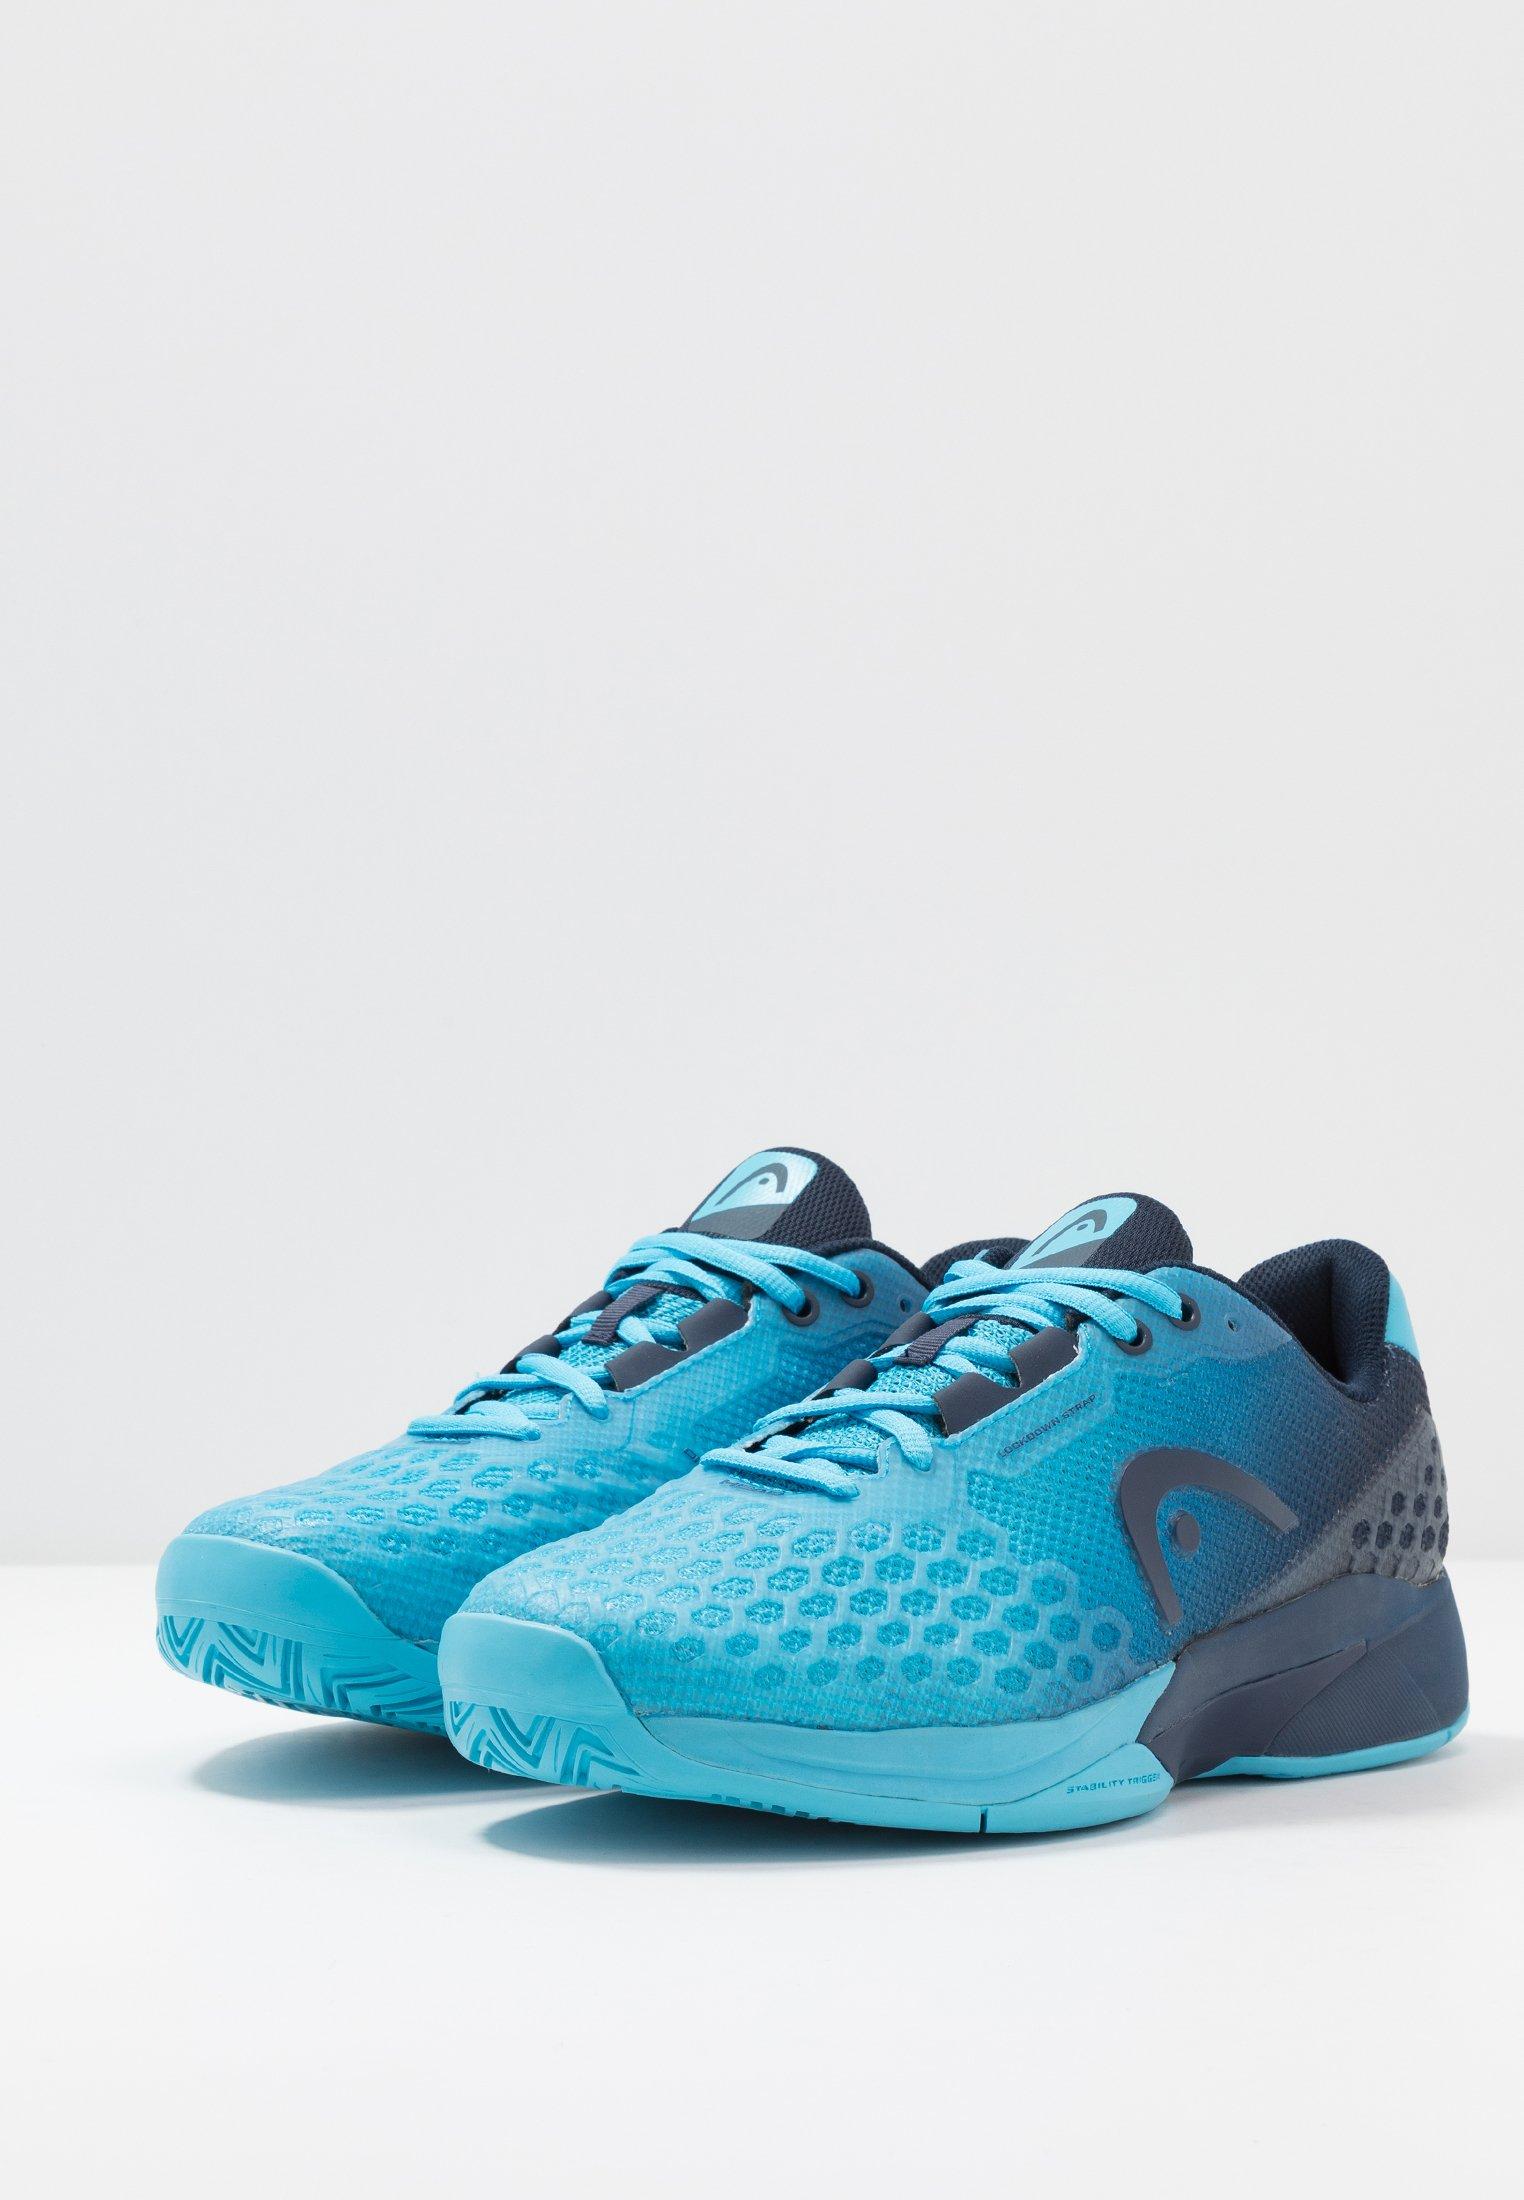 Superfici Blue Pro 3 All Court Tennis Per Head Da Tutte Revolt 0 Le MenScarpe 4A3RLj5